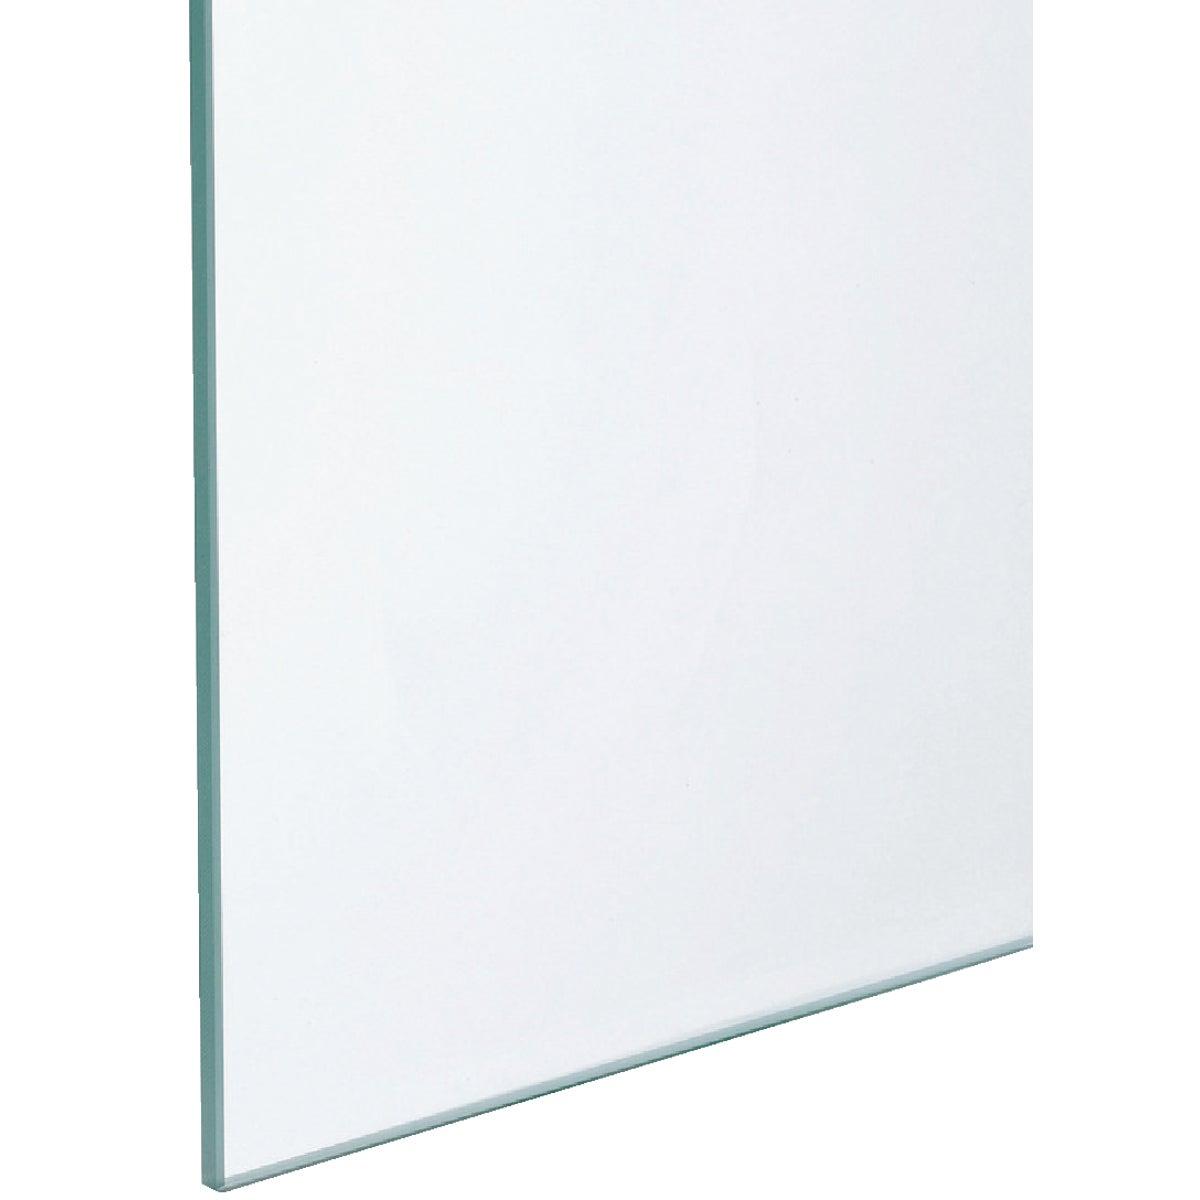 32X40SSB WINDOW GLASS 6 - 32X40 by Knight Industrs Corp